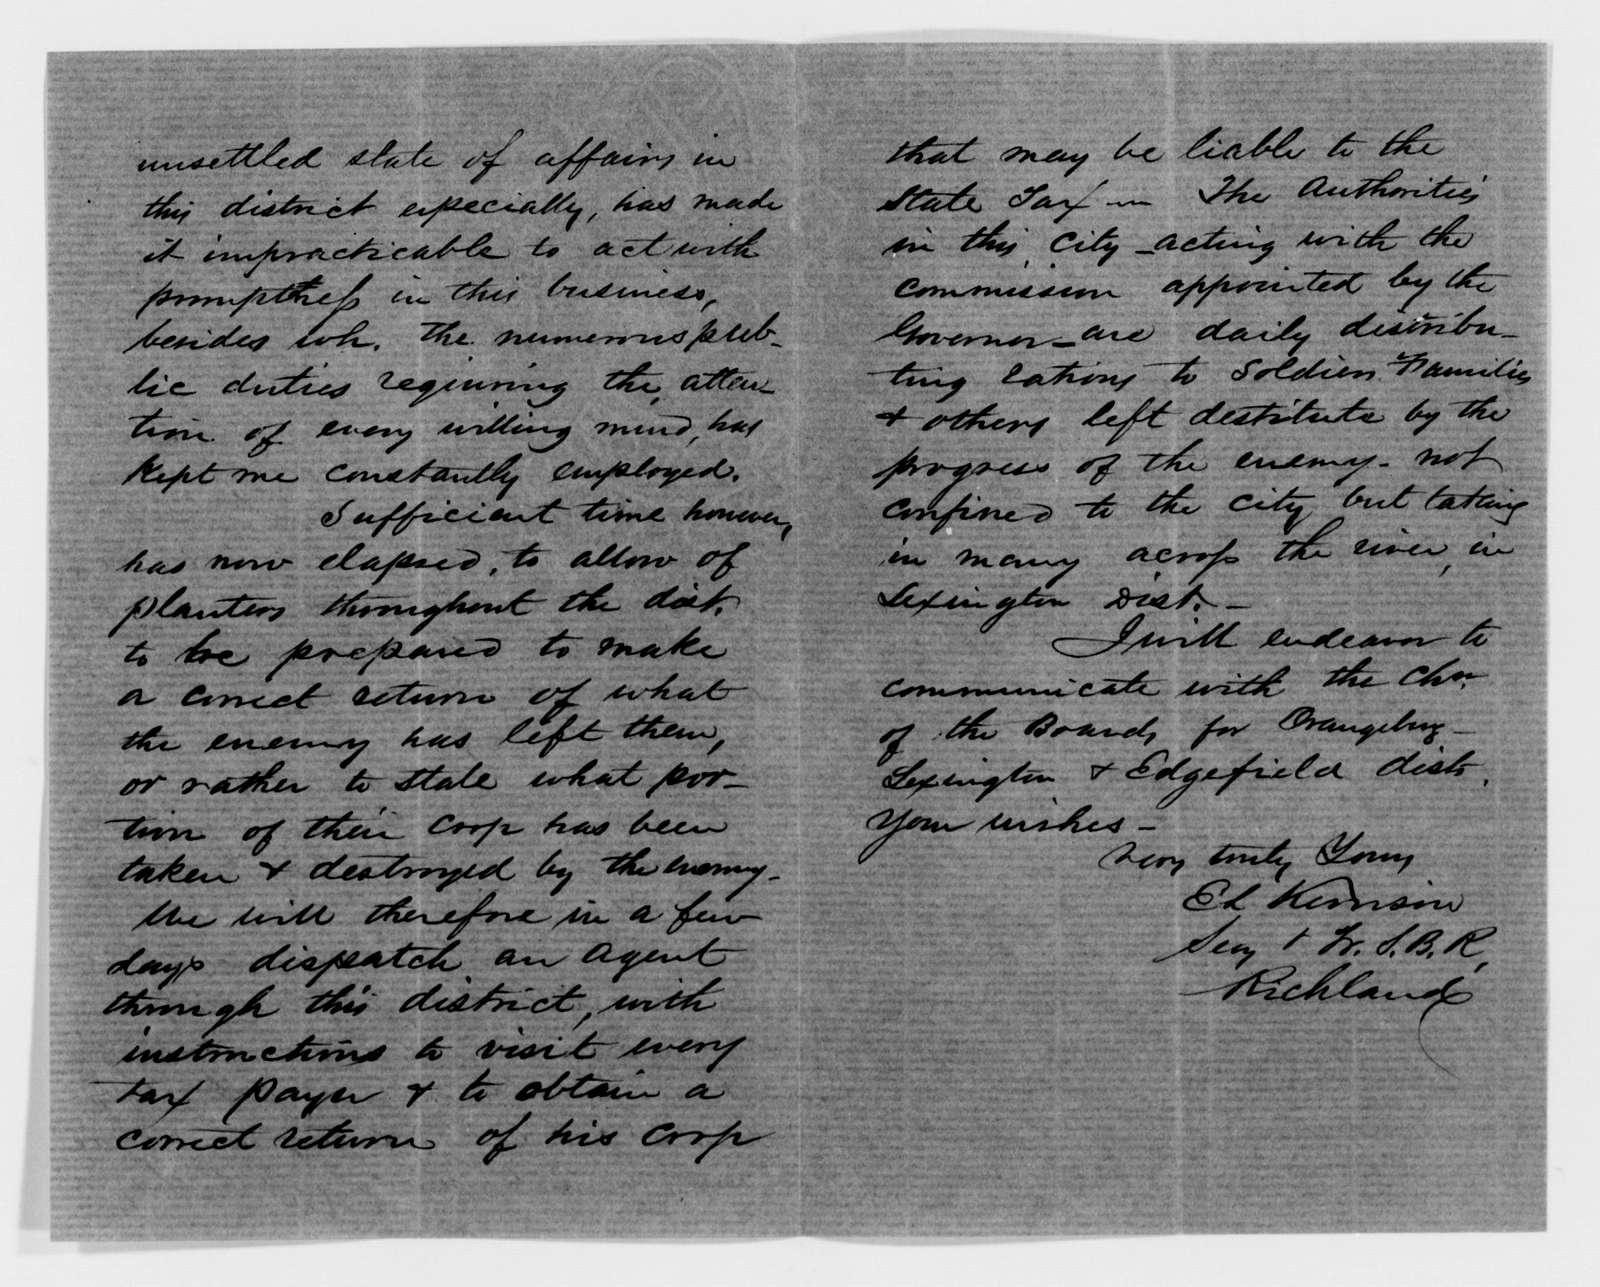 Confederate States of America records: Microfilm Reel 70